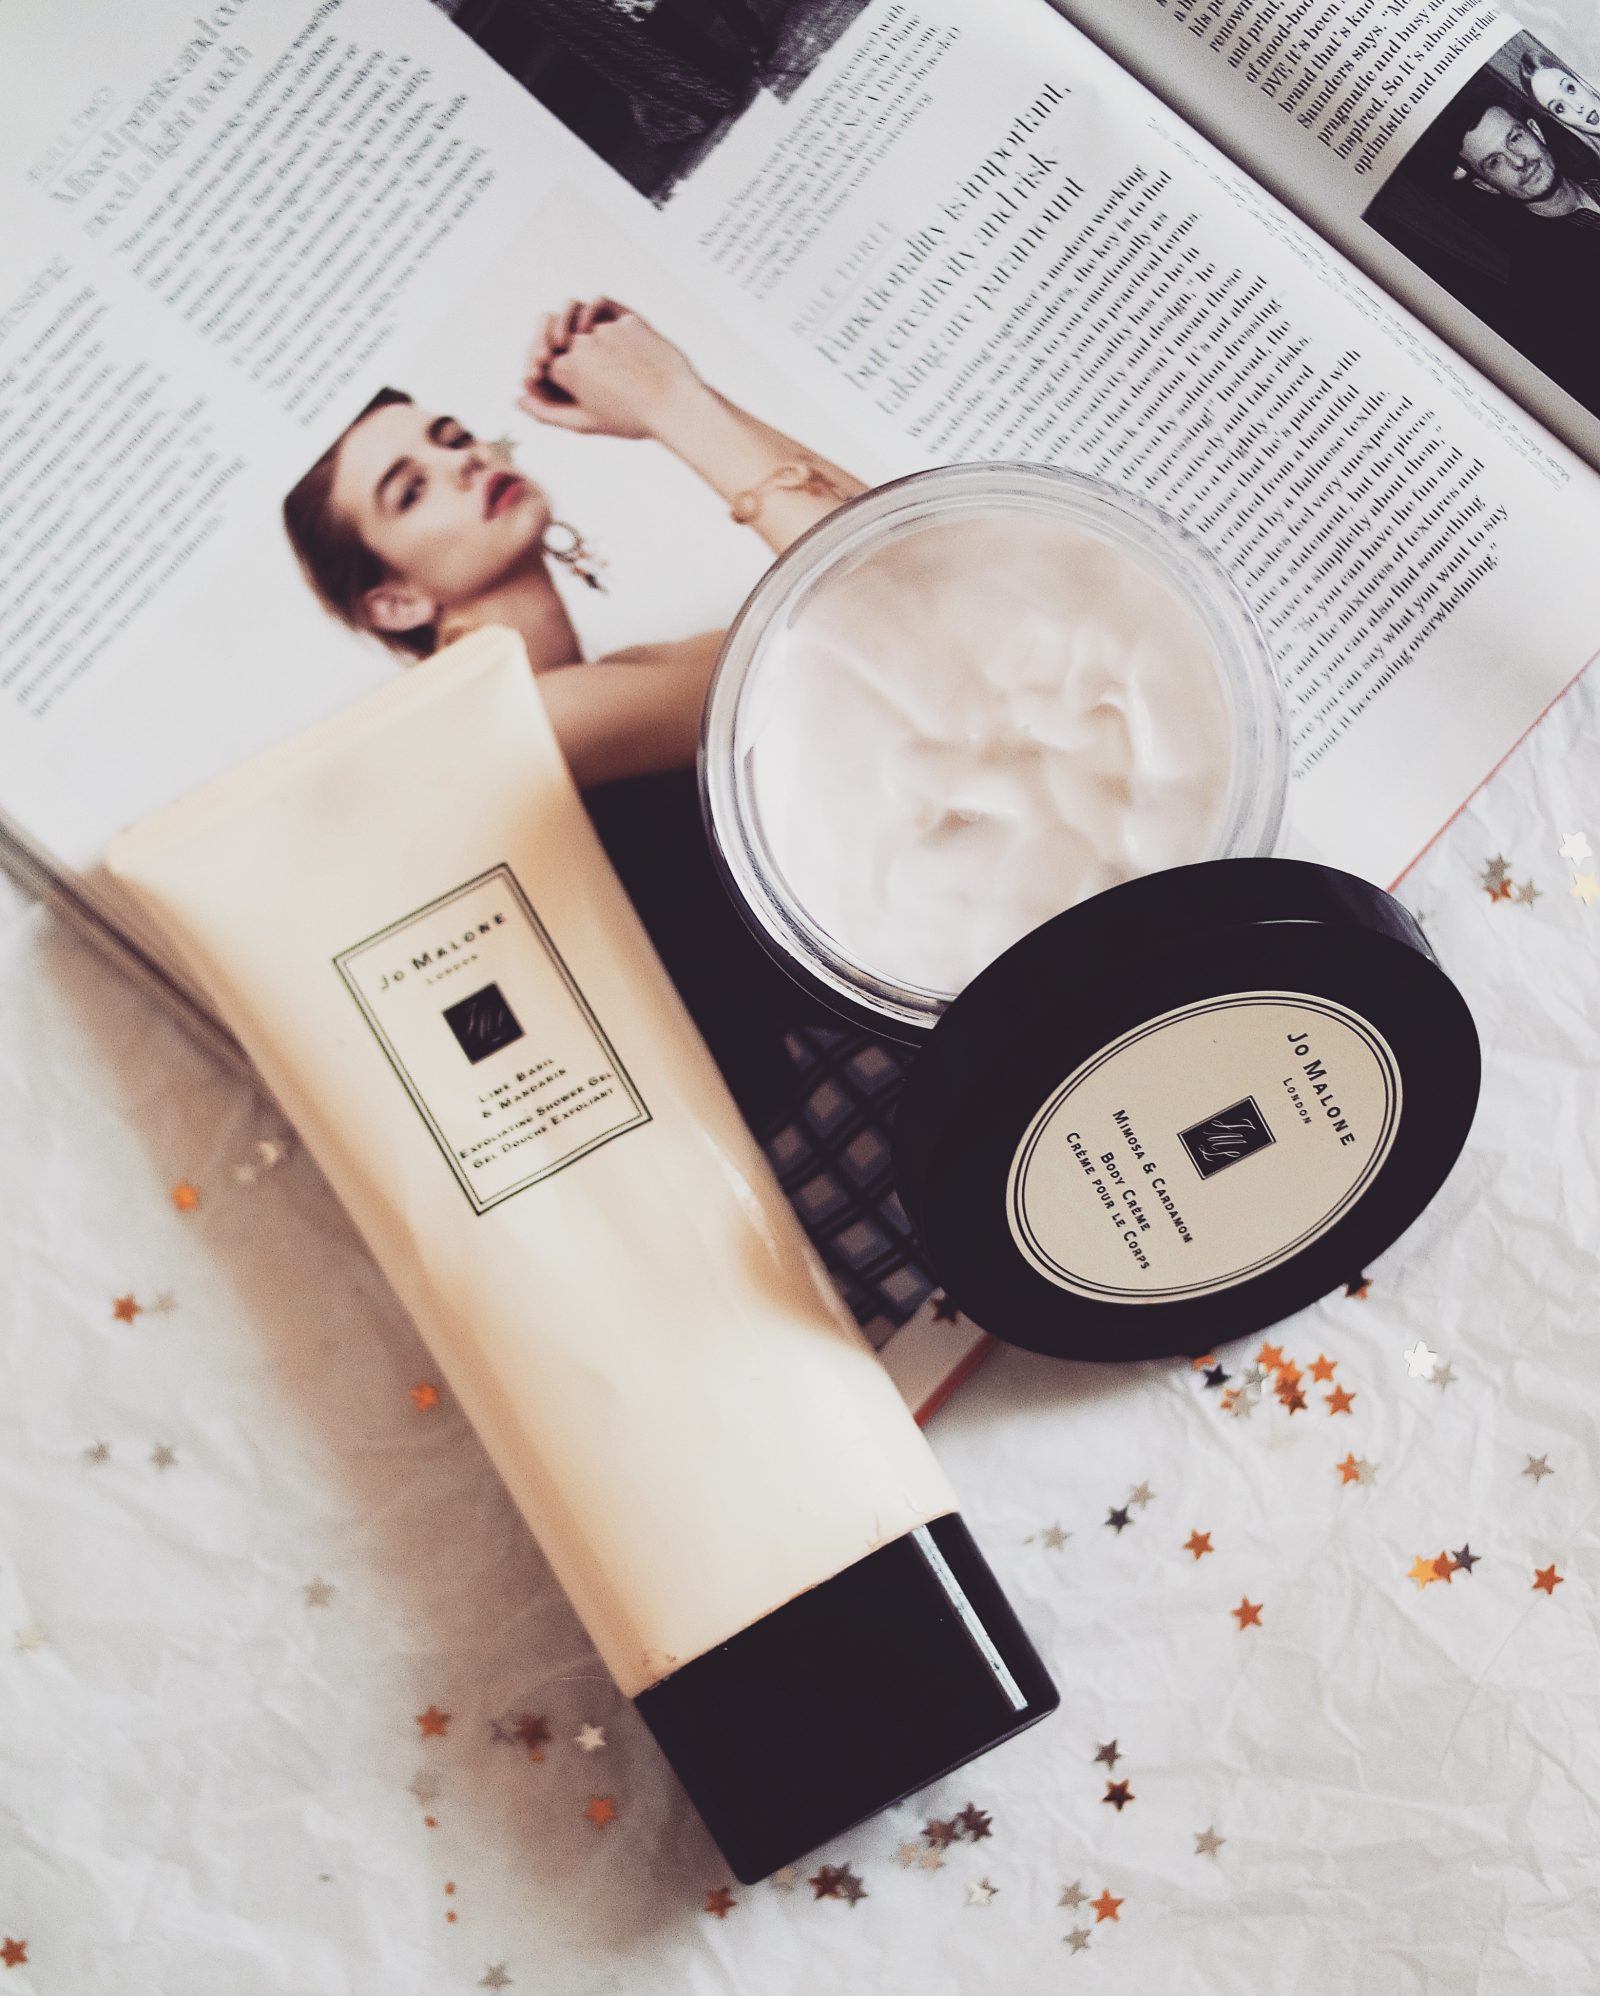 Gift Guide For Him - Jo Malone Skincare